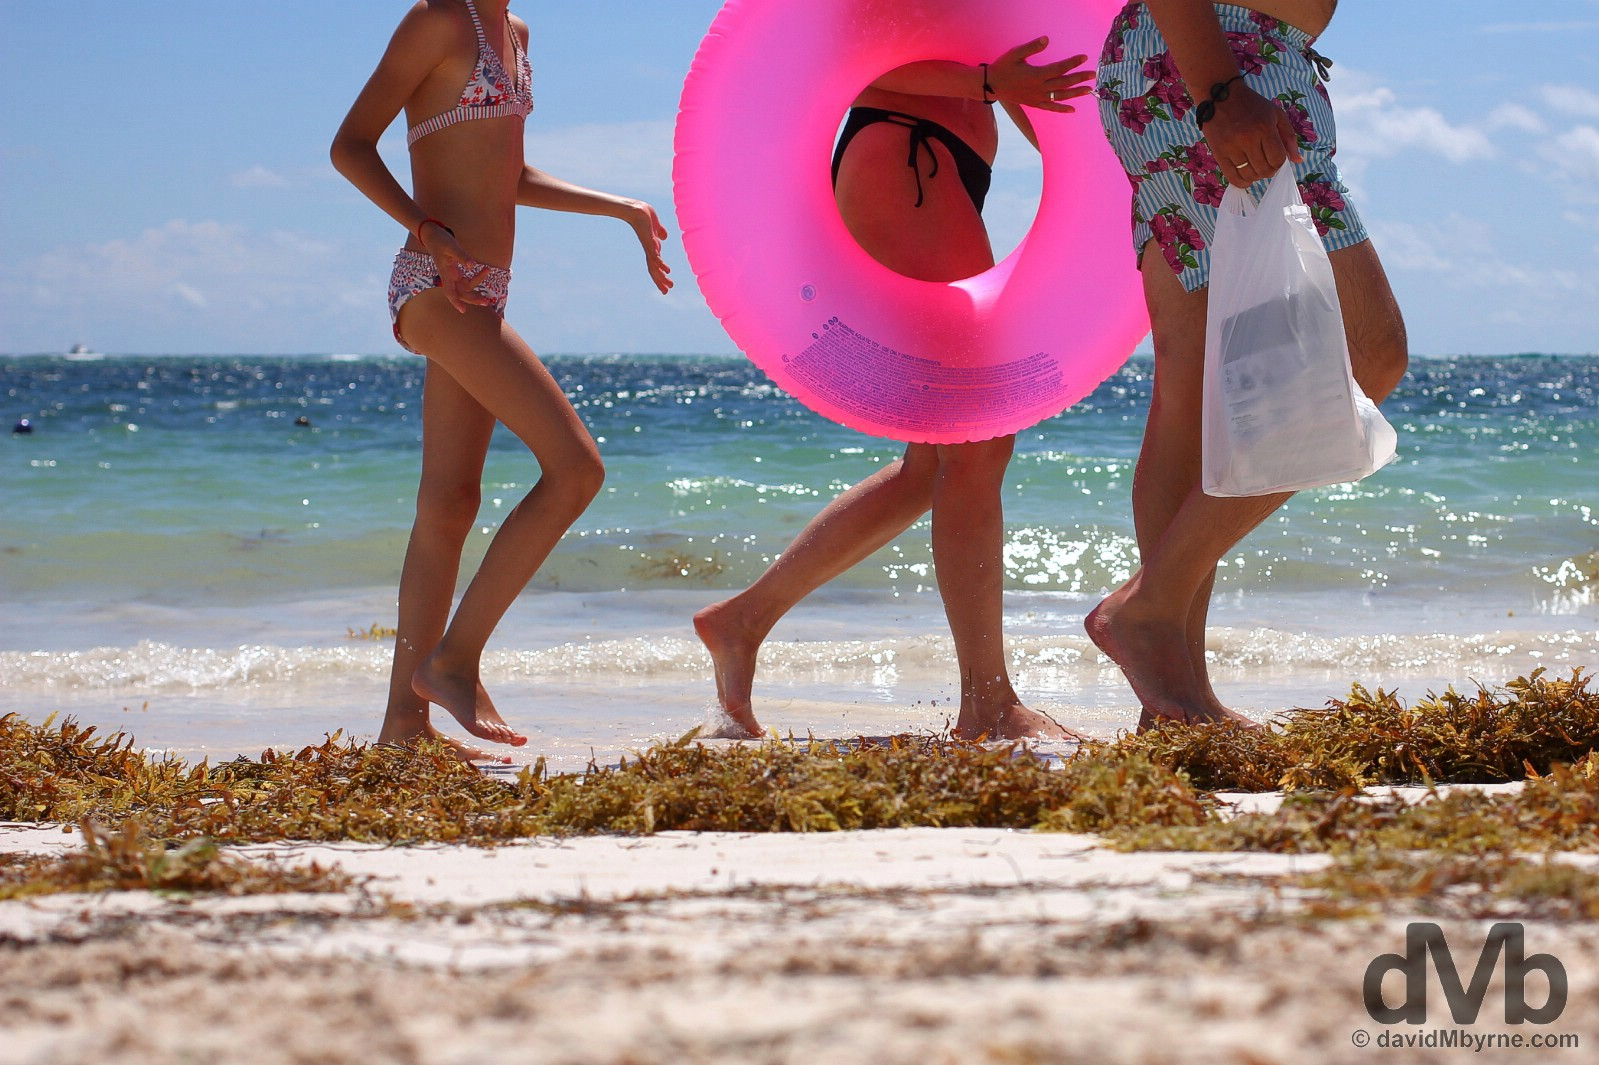 Strolling on Bavaro Beach, Punta Cana, Dominican Republic. May 28, 2015.